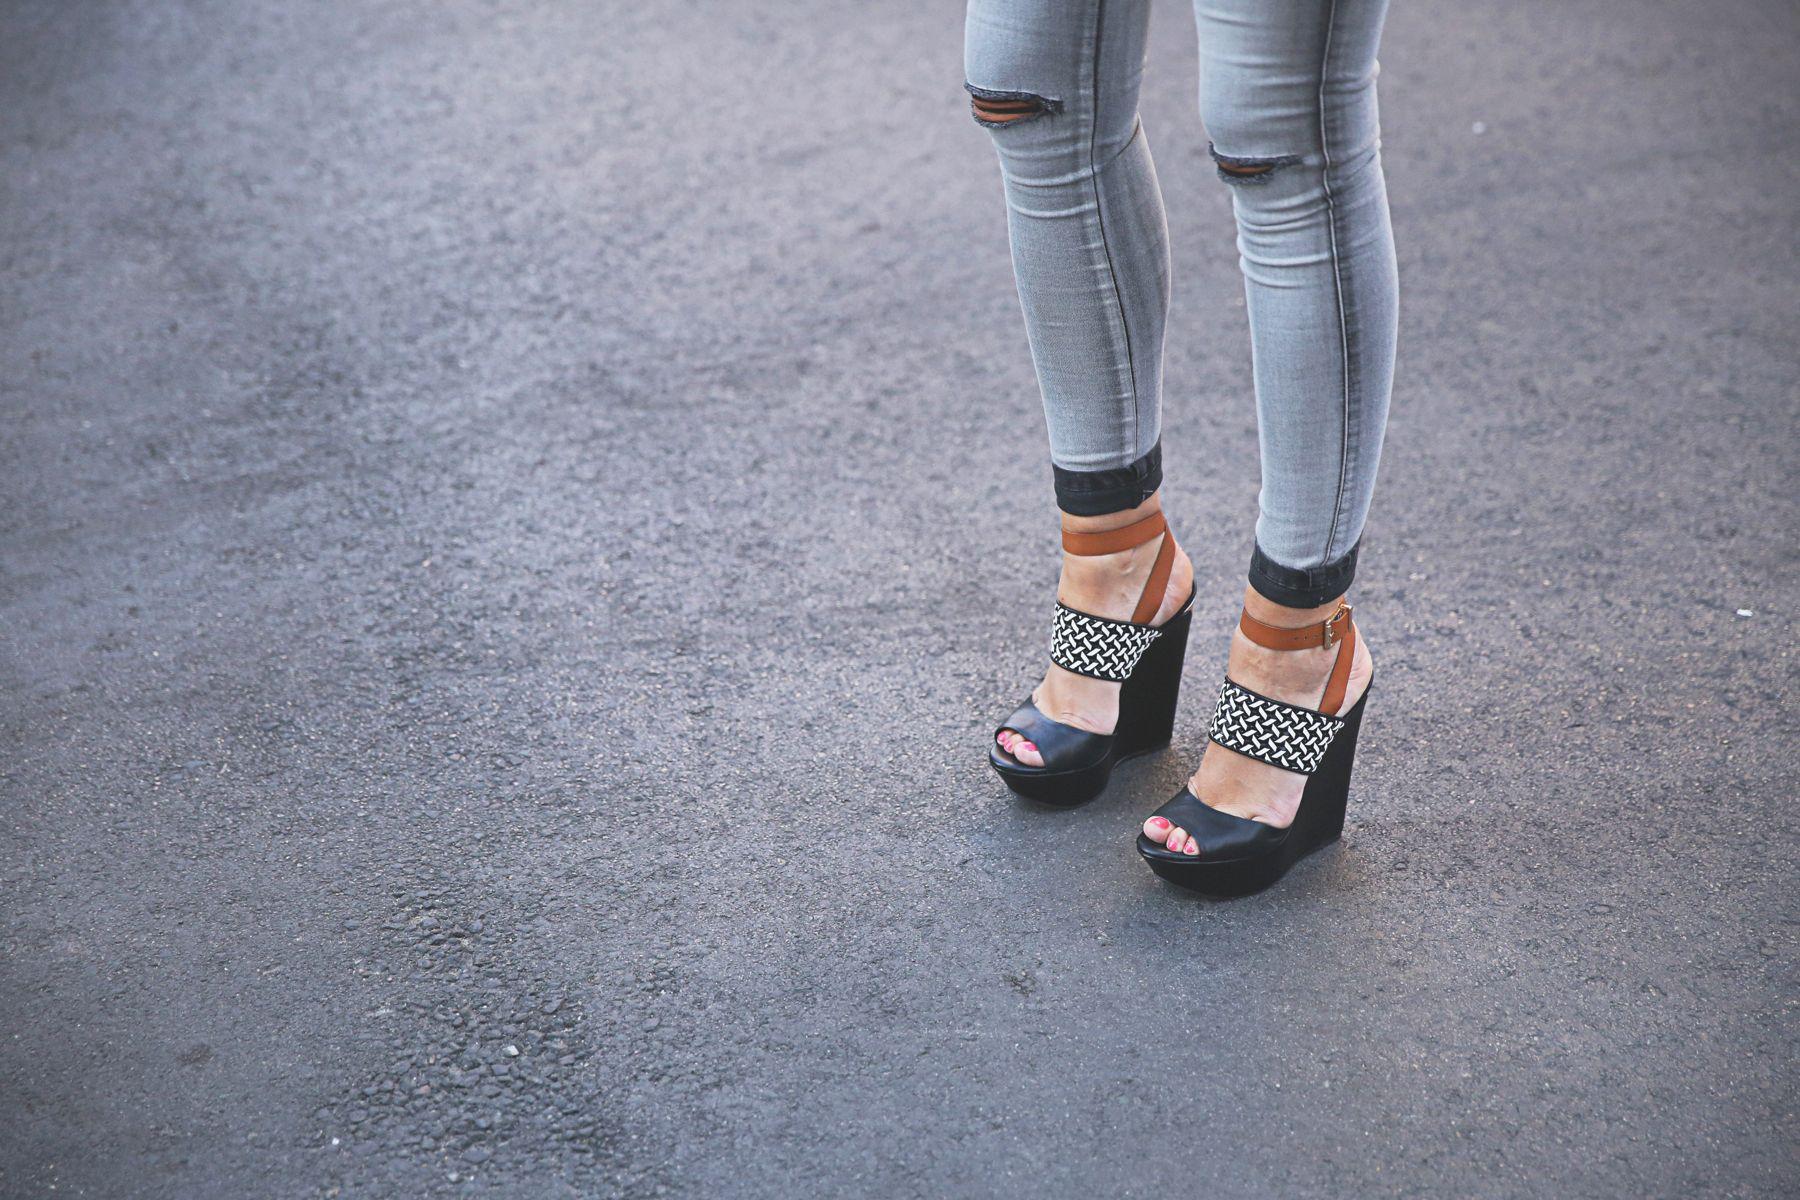 trendy-taste-look-outfit-street-style-ootd-blog-blogger-fashion-spain-moda-españa-SS15-verano2015-tendencias-trends-zara-buylevard-valentino-jessica-simpson-skinny-jeans-grey-white-blazer-americana-blanca-vaqueros-pitillo-sandalias-sandals-etnicas-11